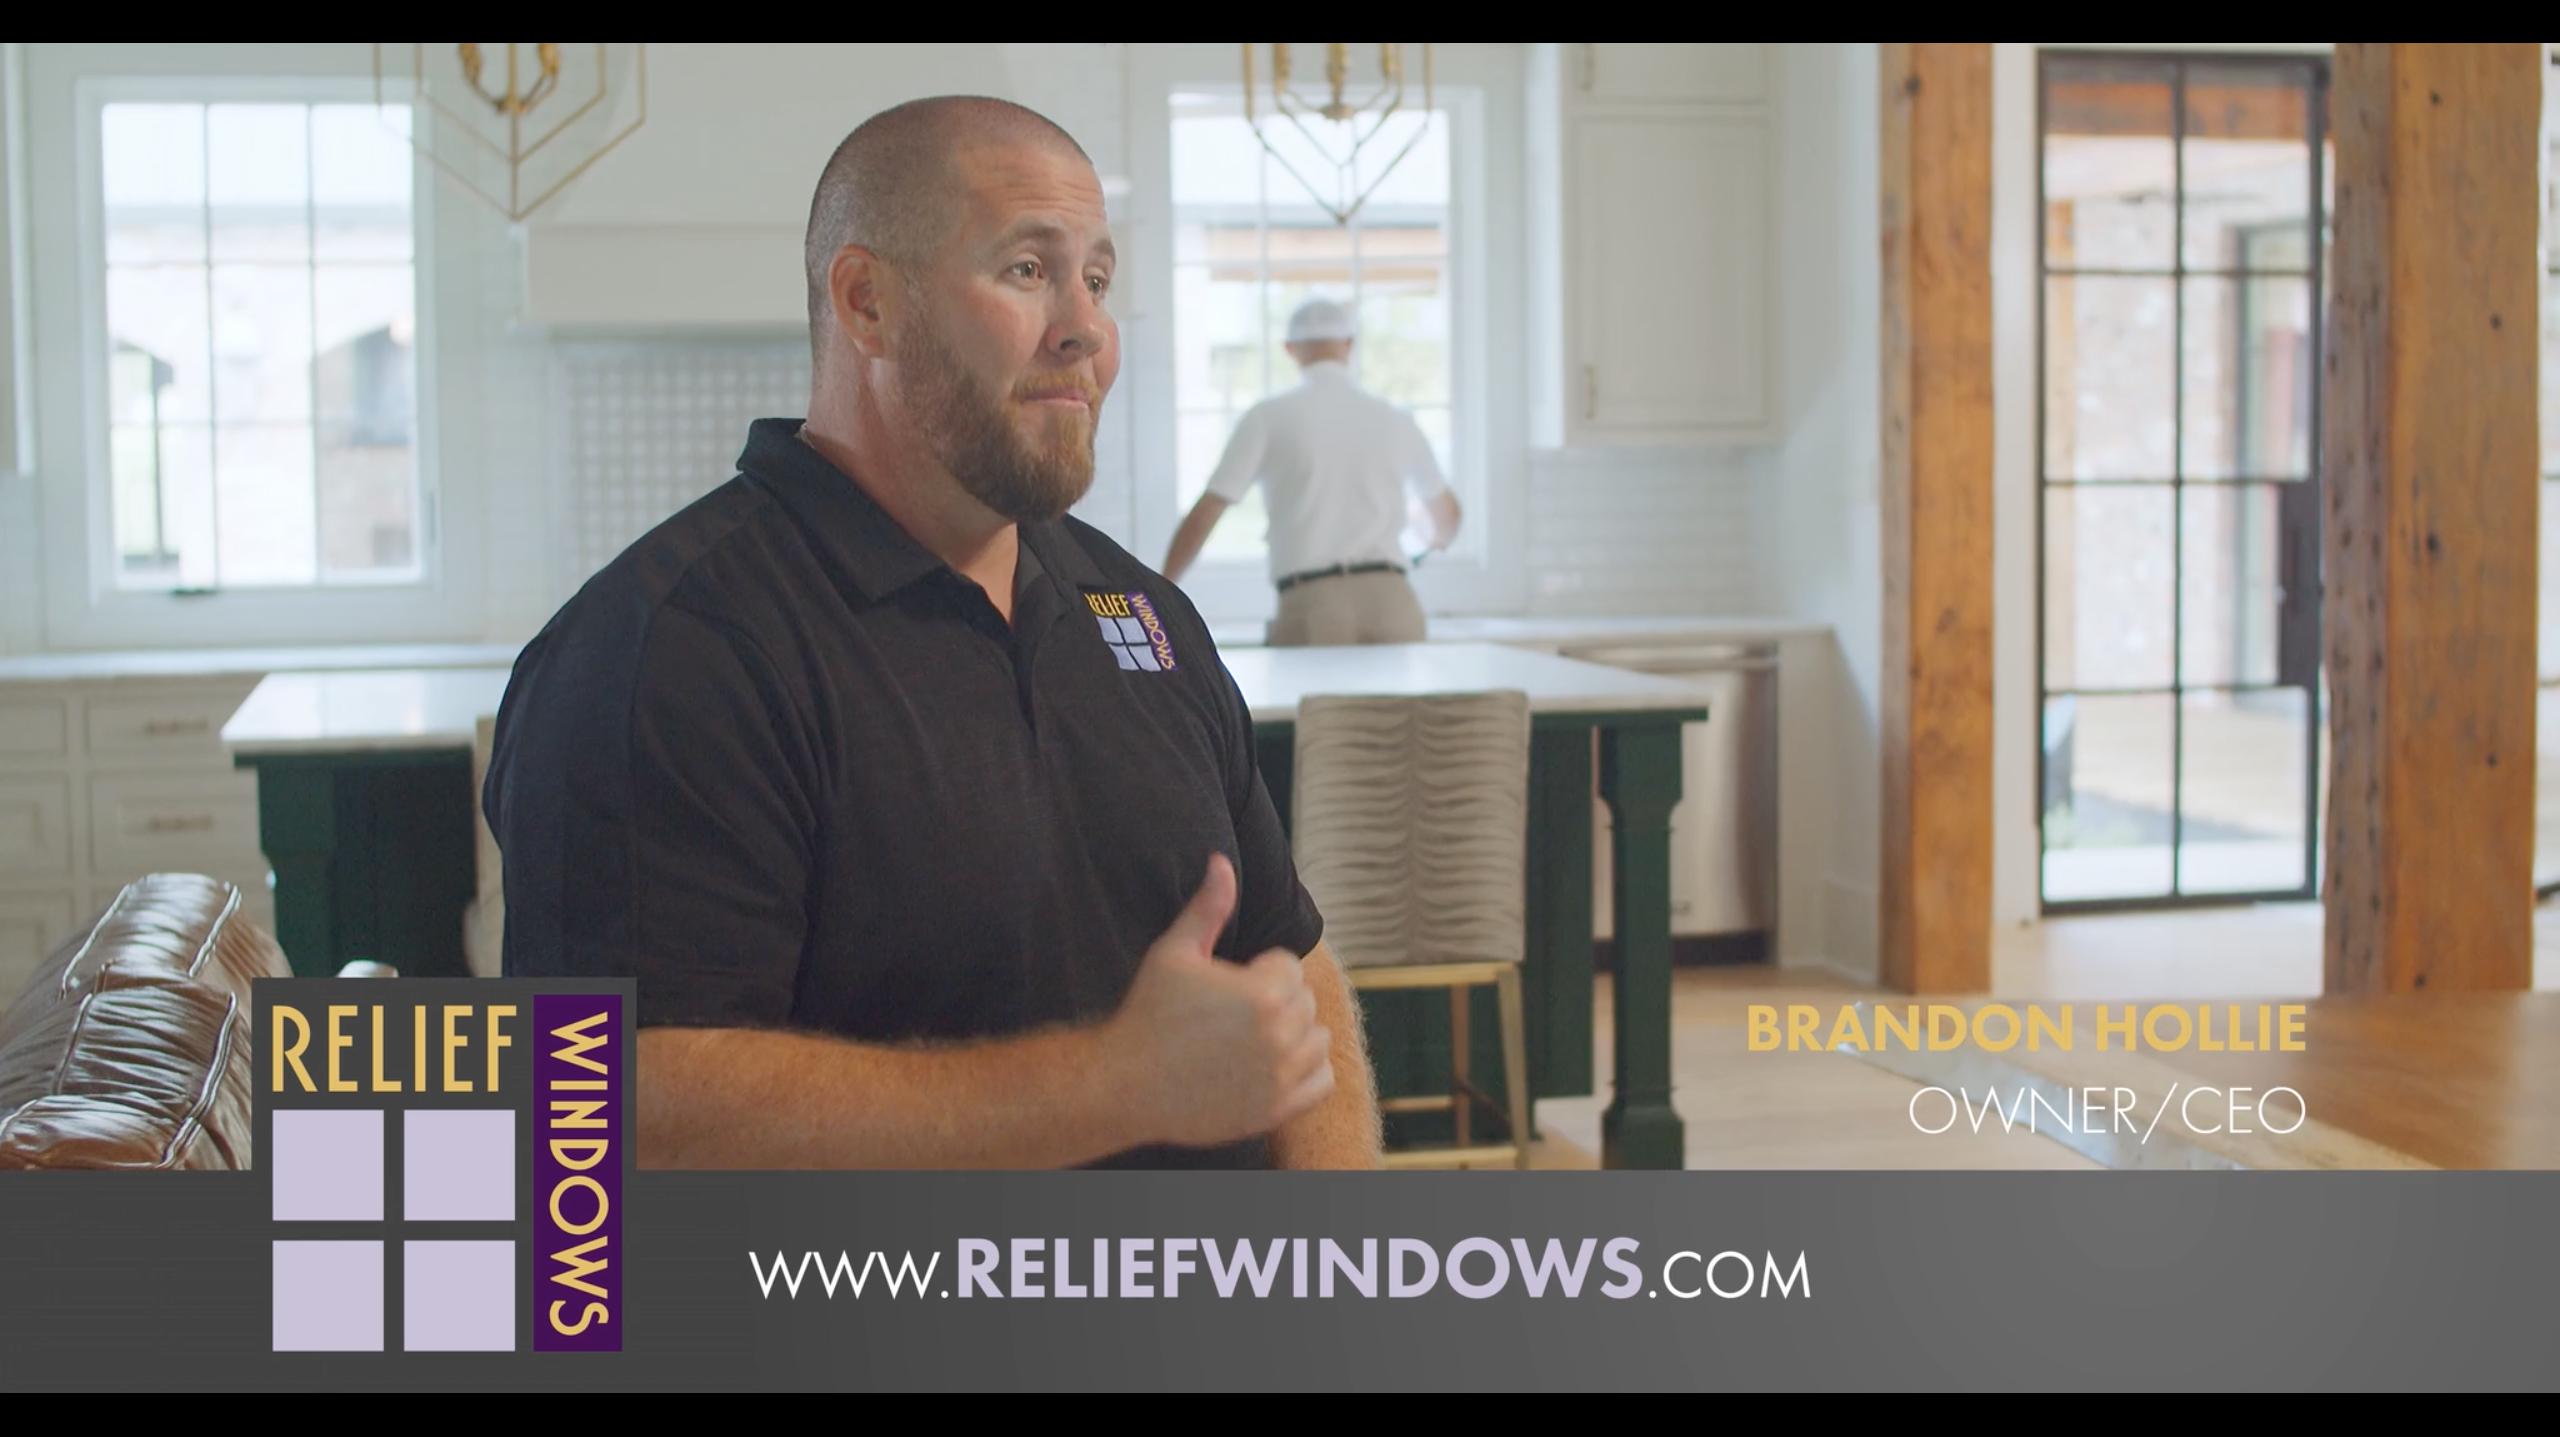 Relief Windows